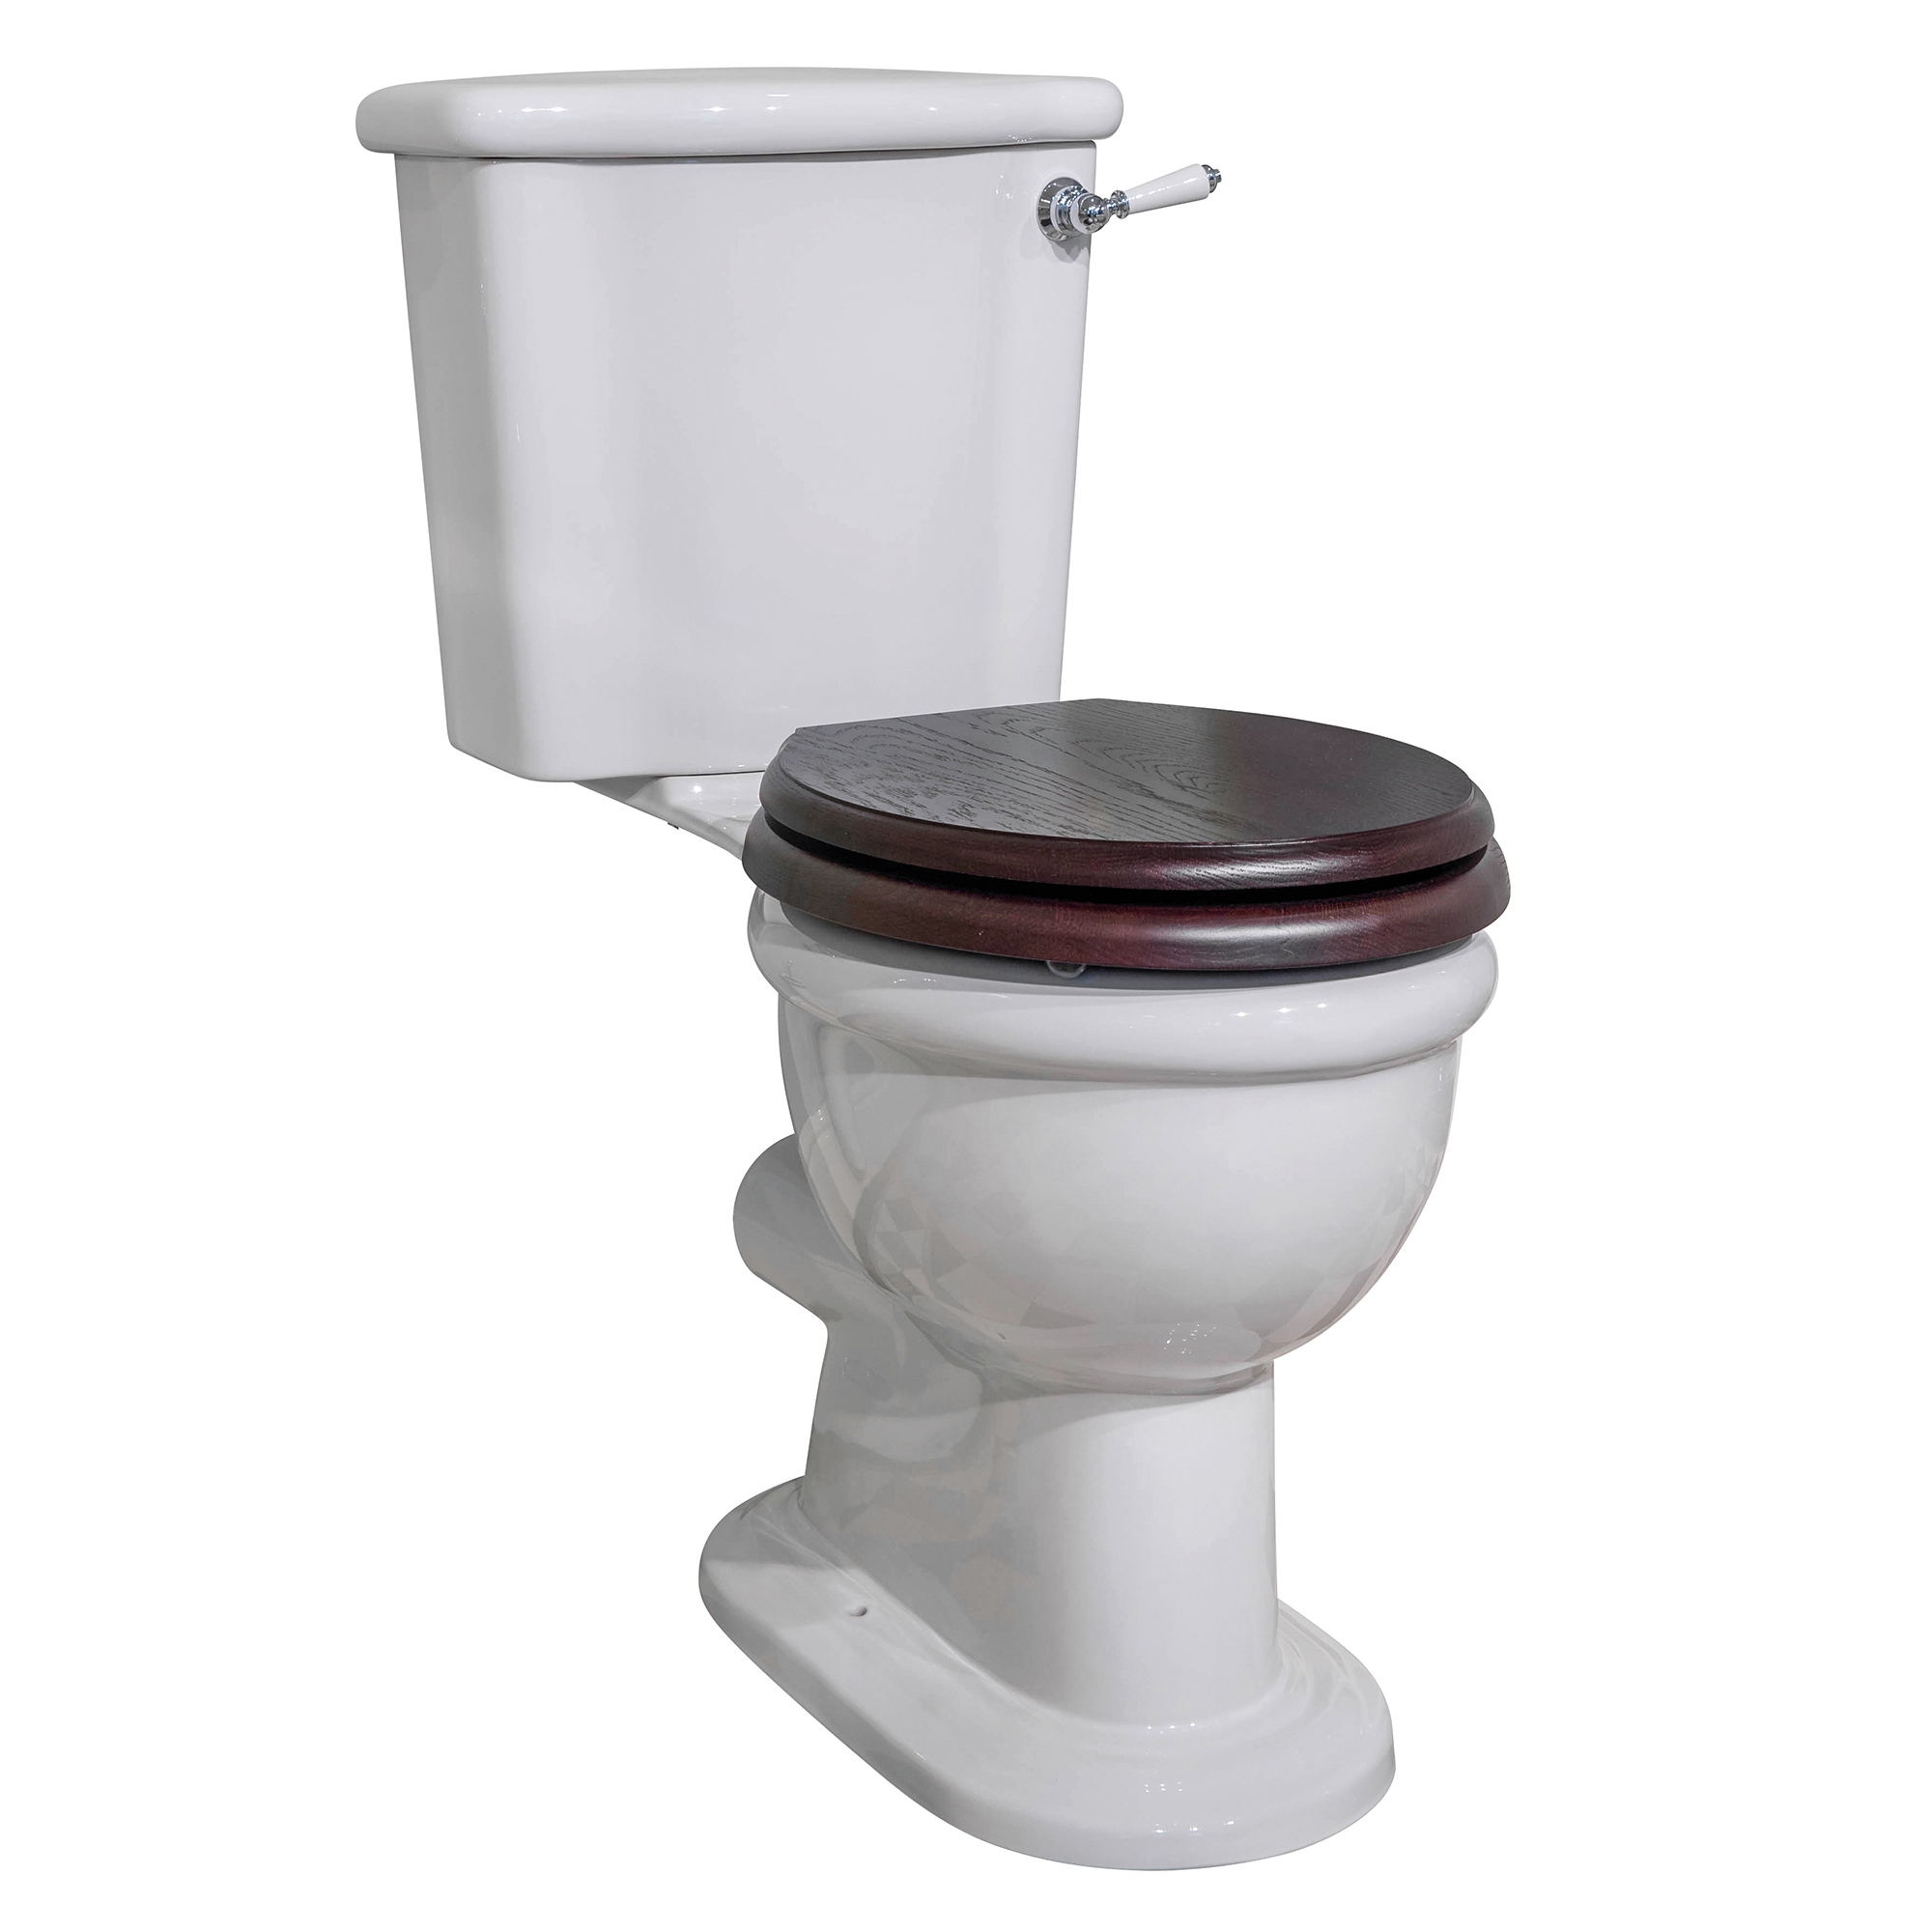 Favorit HELEN WC-Kombination mit aufgesetztem Spülkasten – TRADITIONAL OB21